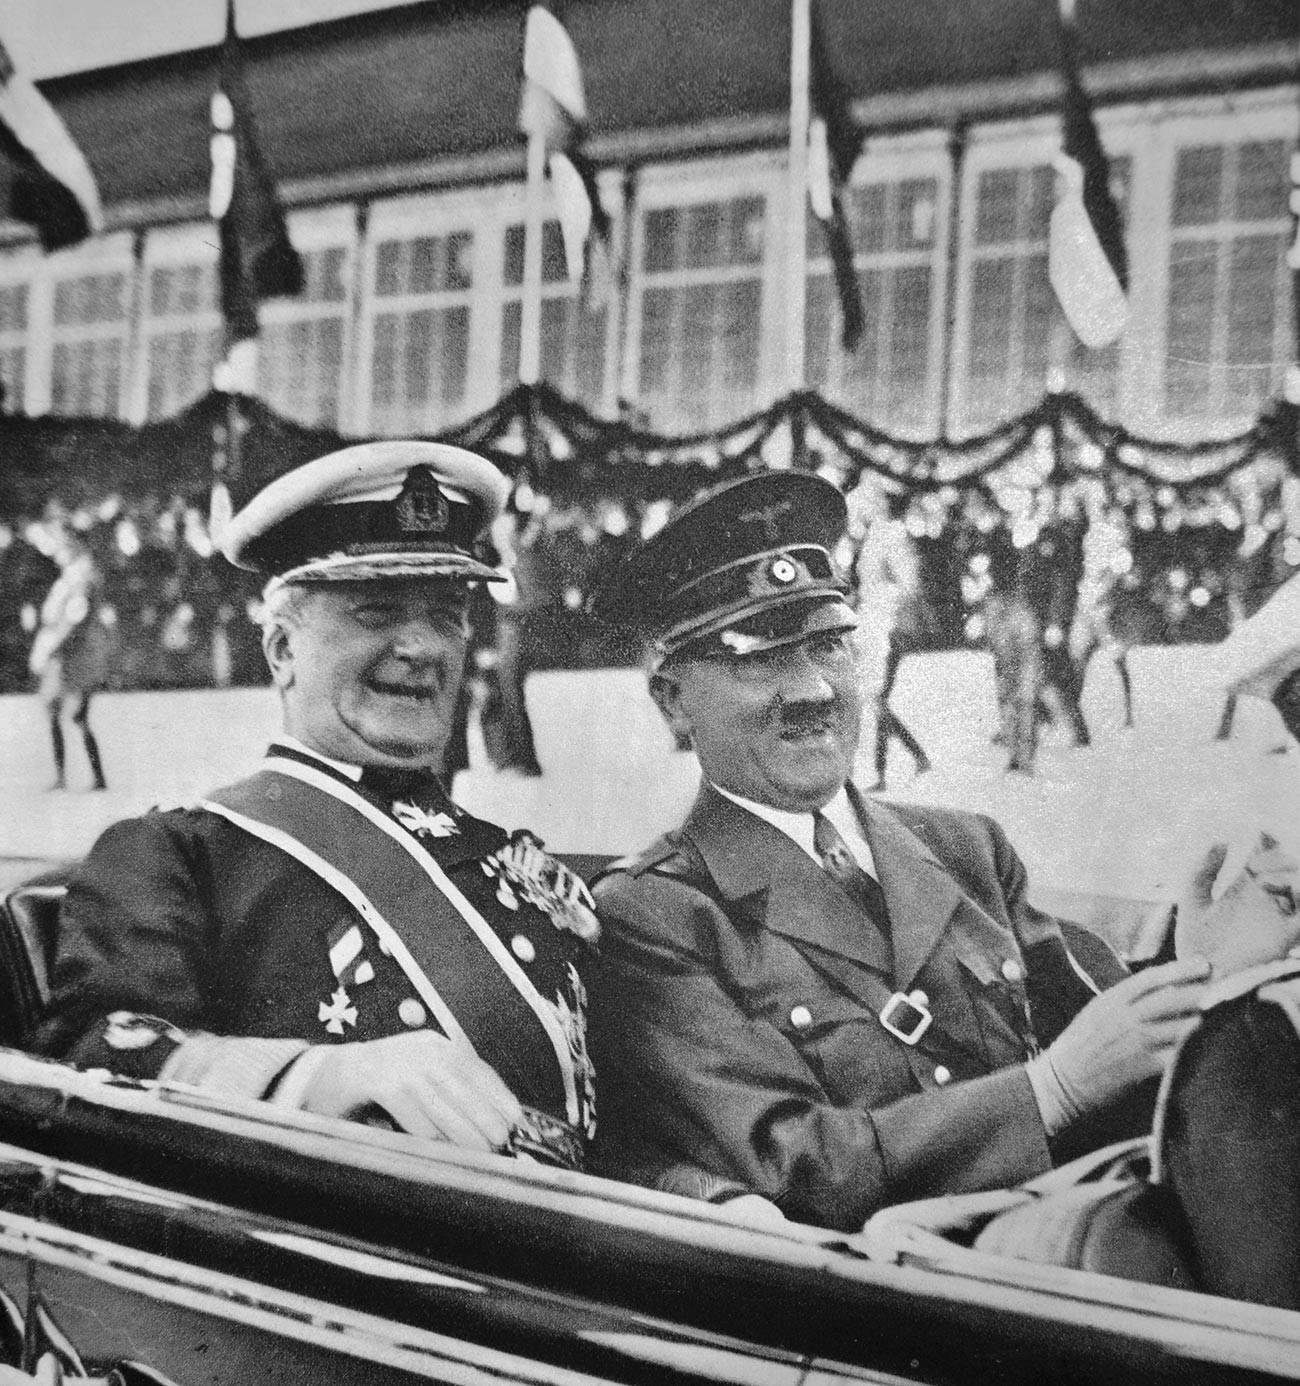 Мађарски лидер Миклош Хорти и Адолф Хитлер 1938.